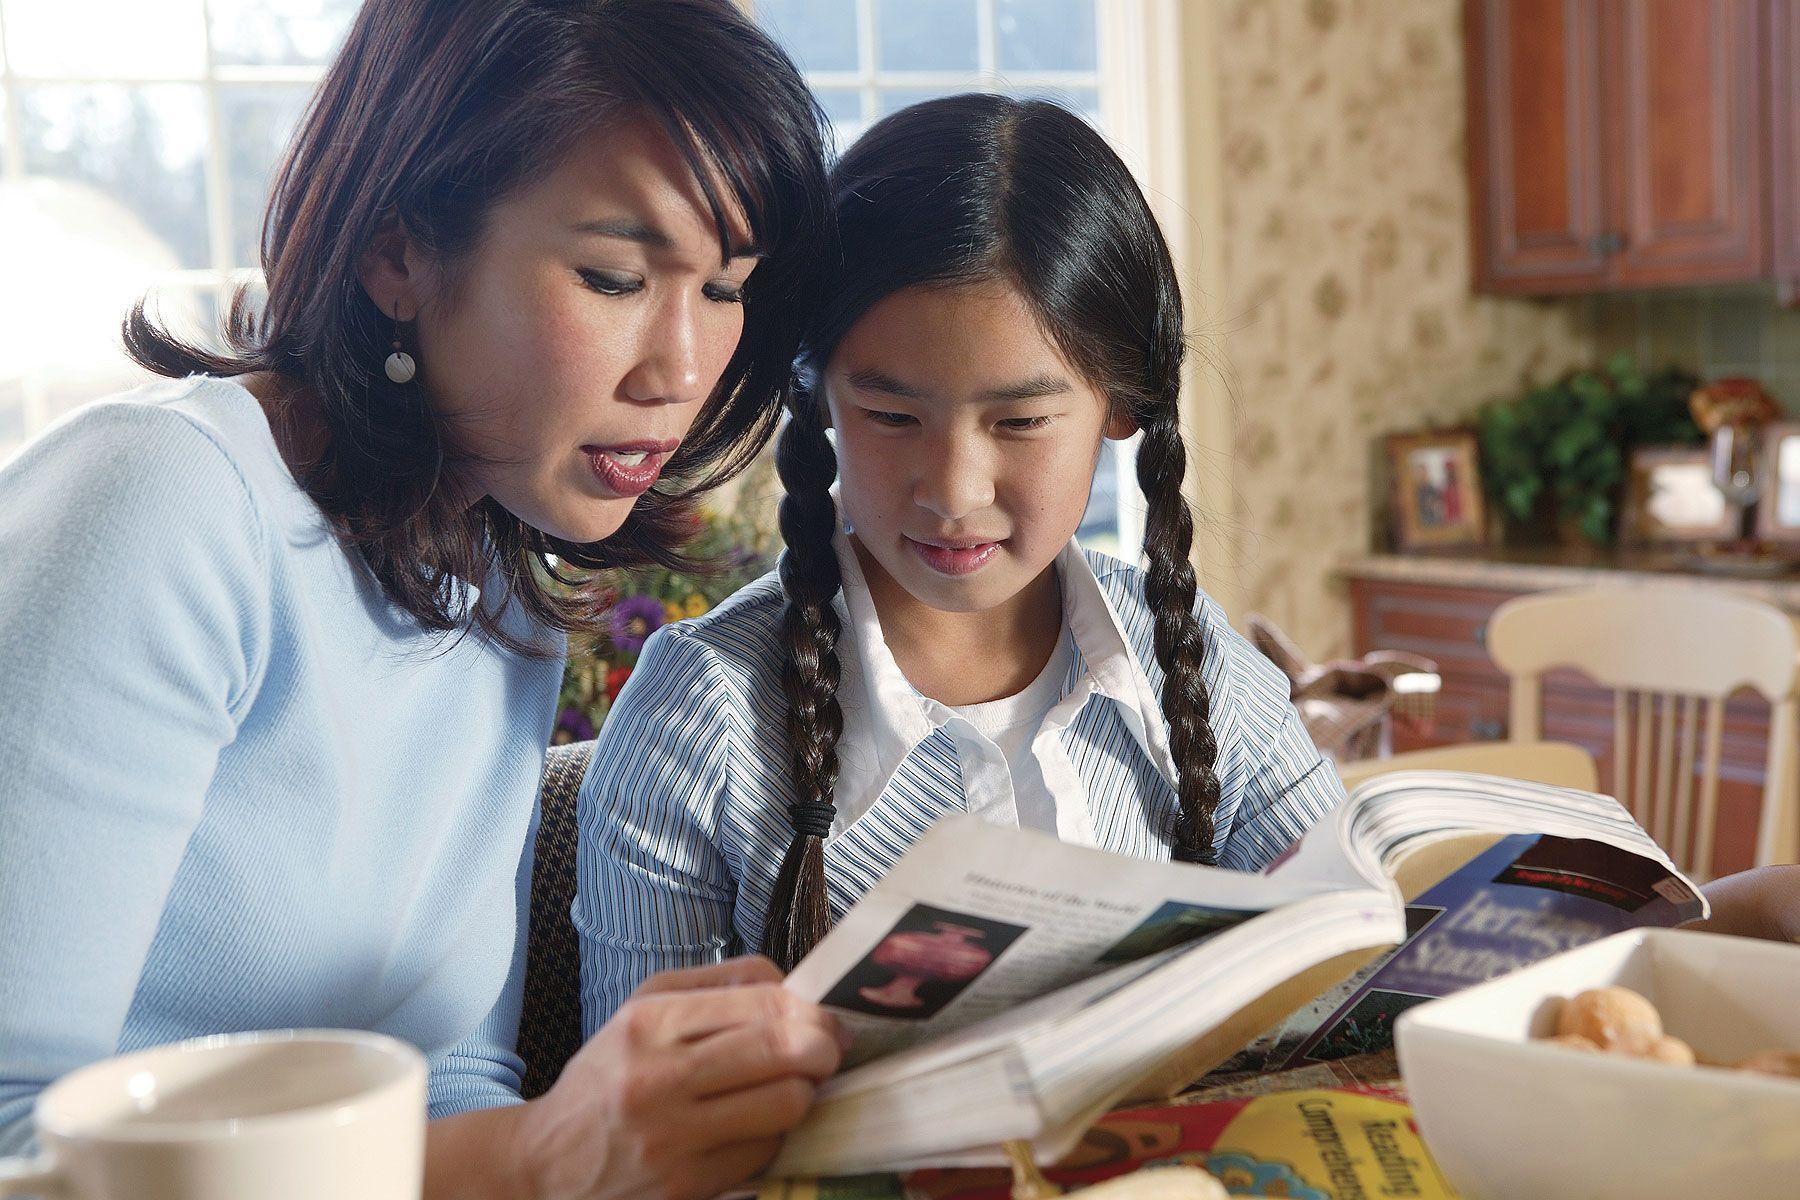 6. Ciptakan nuansa belajar baik